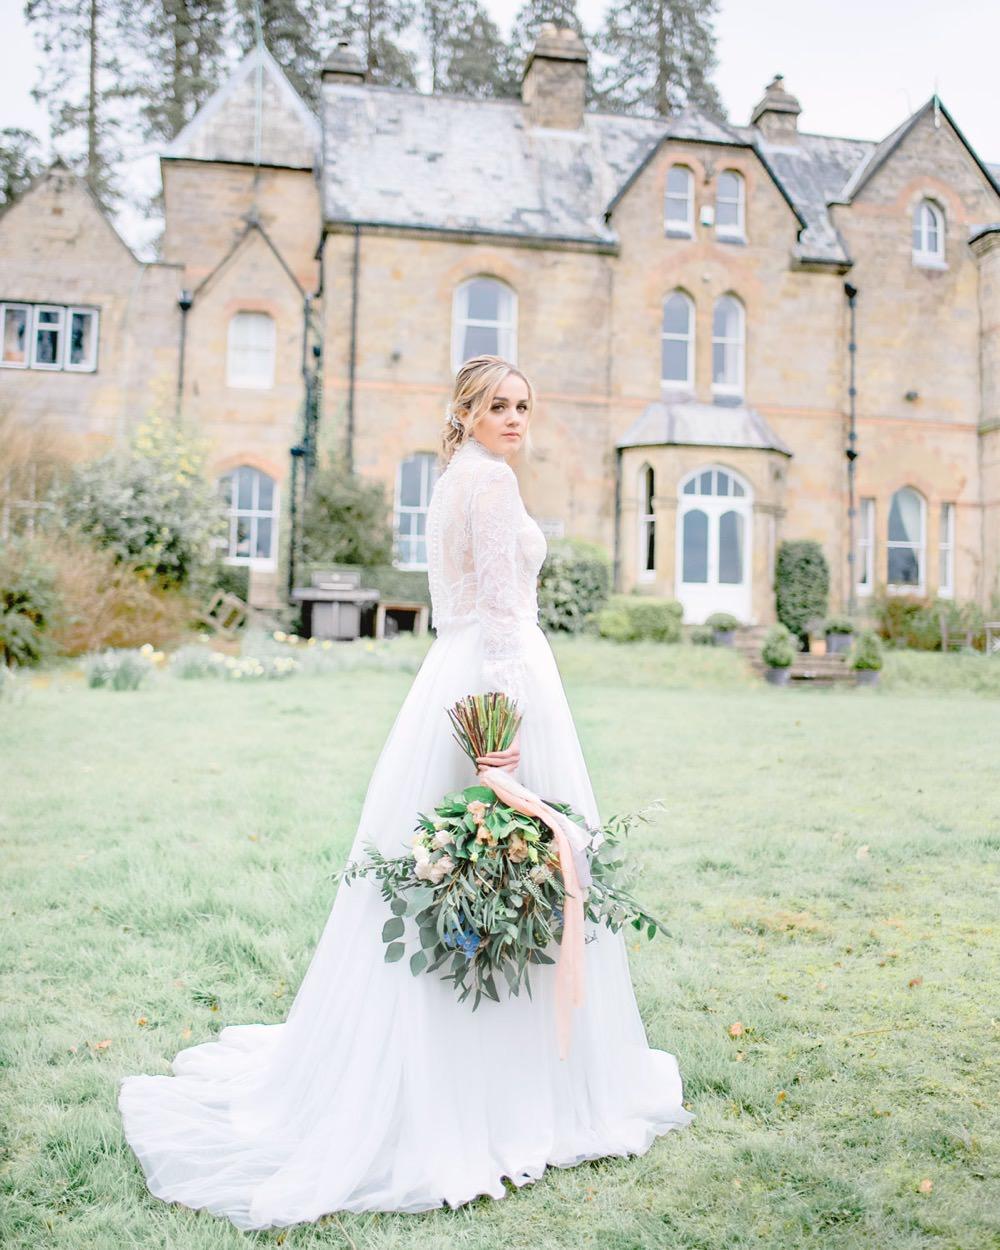 Bride Bridal Dress Gown High Neckline Lace Sleeves Tulle Skirt Elegant Wedding Ideas Yll Weddings